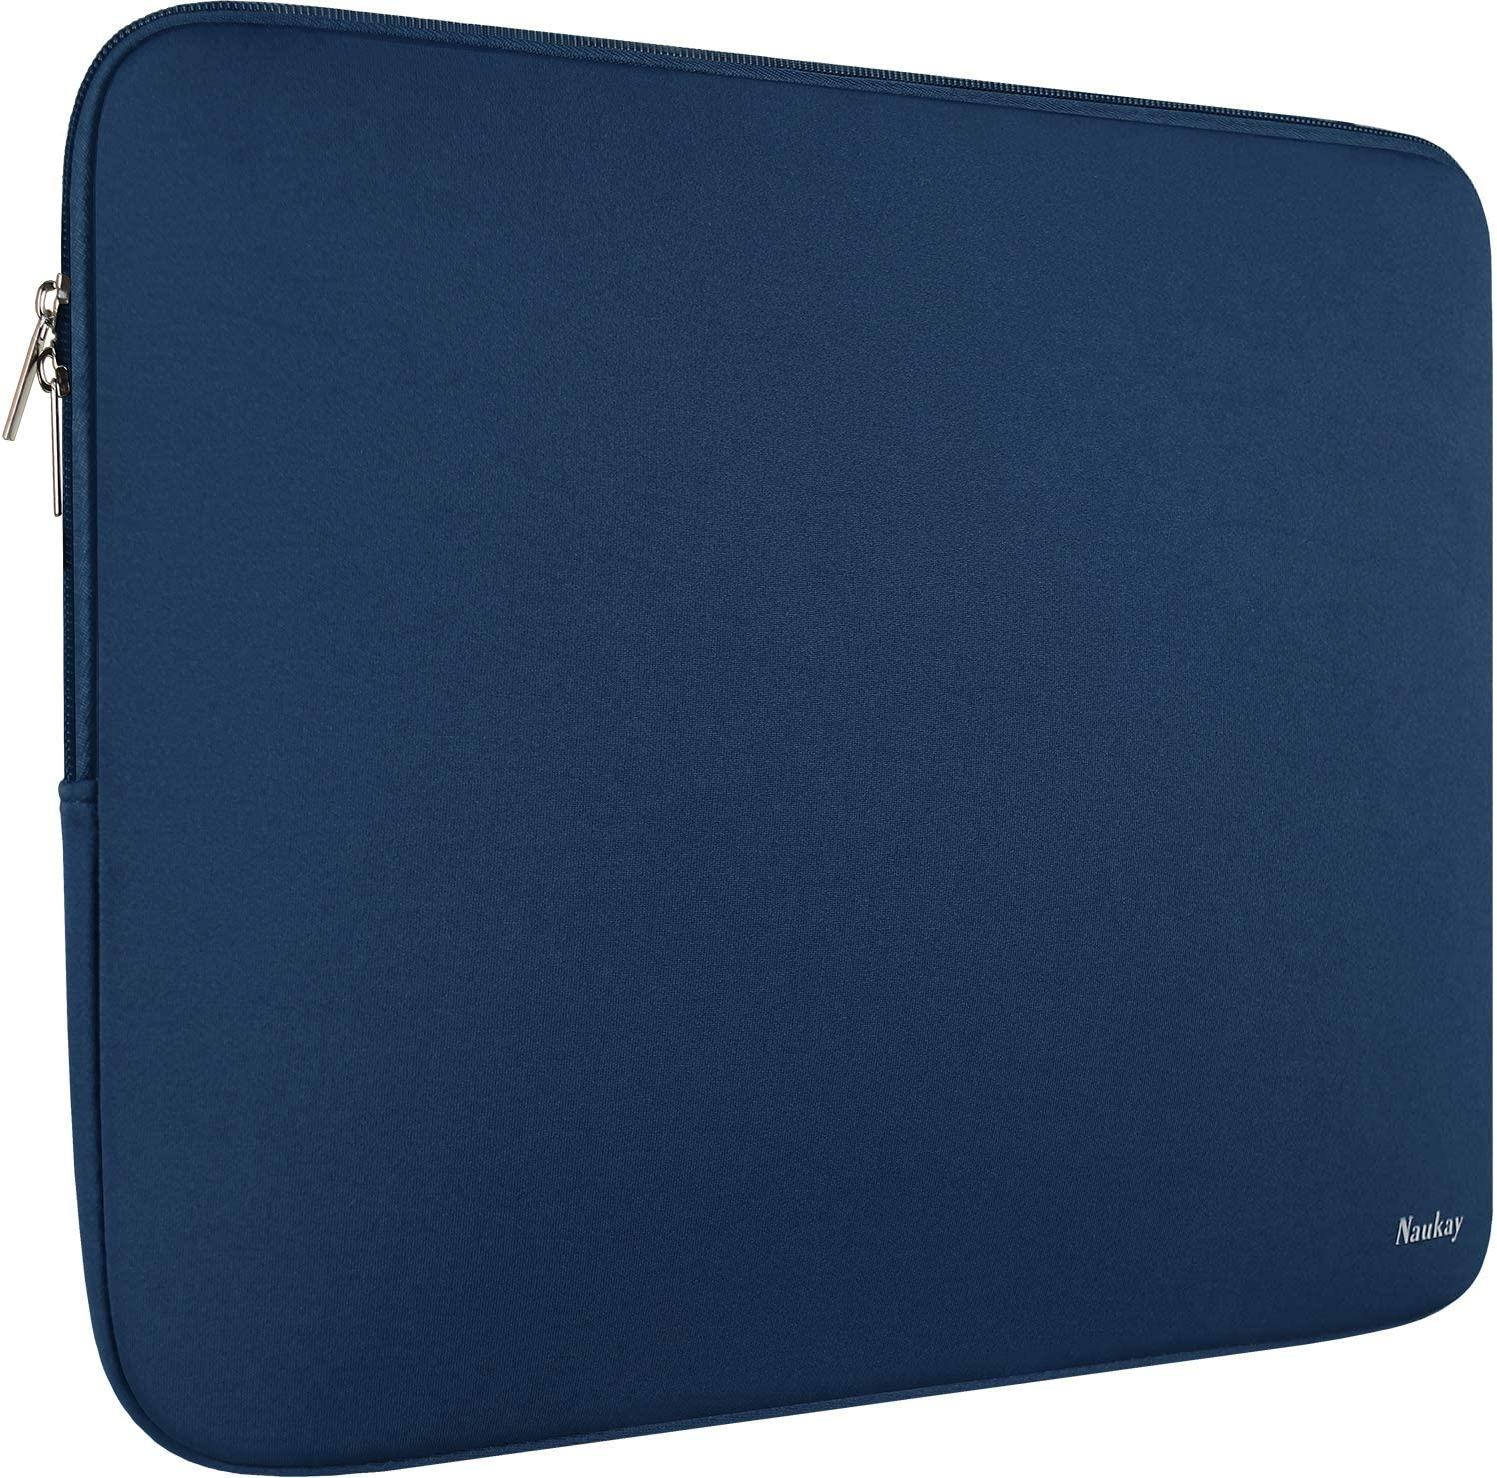 Laptop Sleeve Case 15.6 Inch,Resistant Neoprene Laptop Sleeve/Notebook Computer Pocket Case/Tablet Briefcase Carrying Bag - Dark Blue